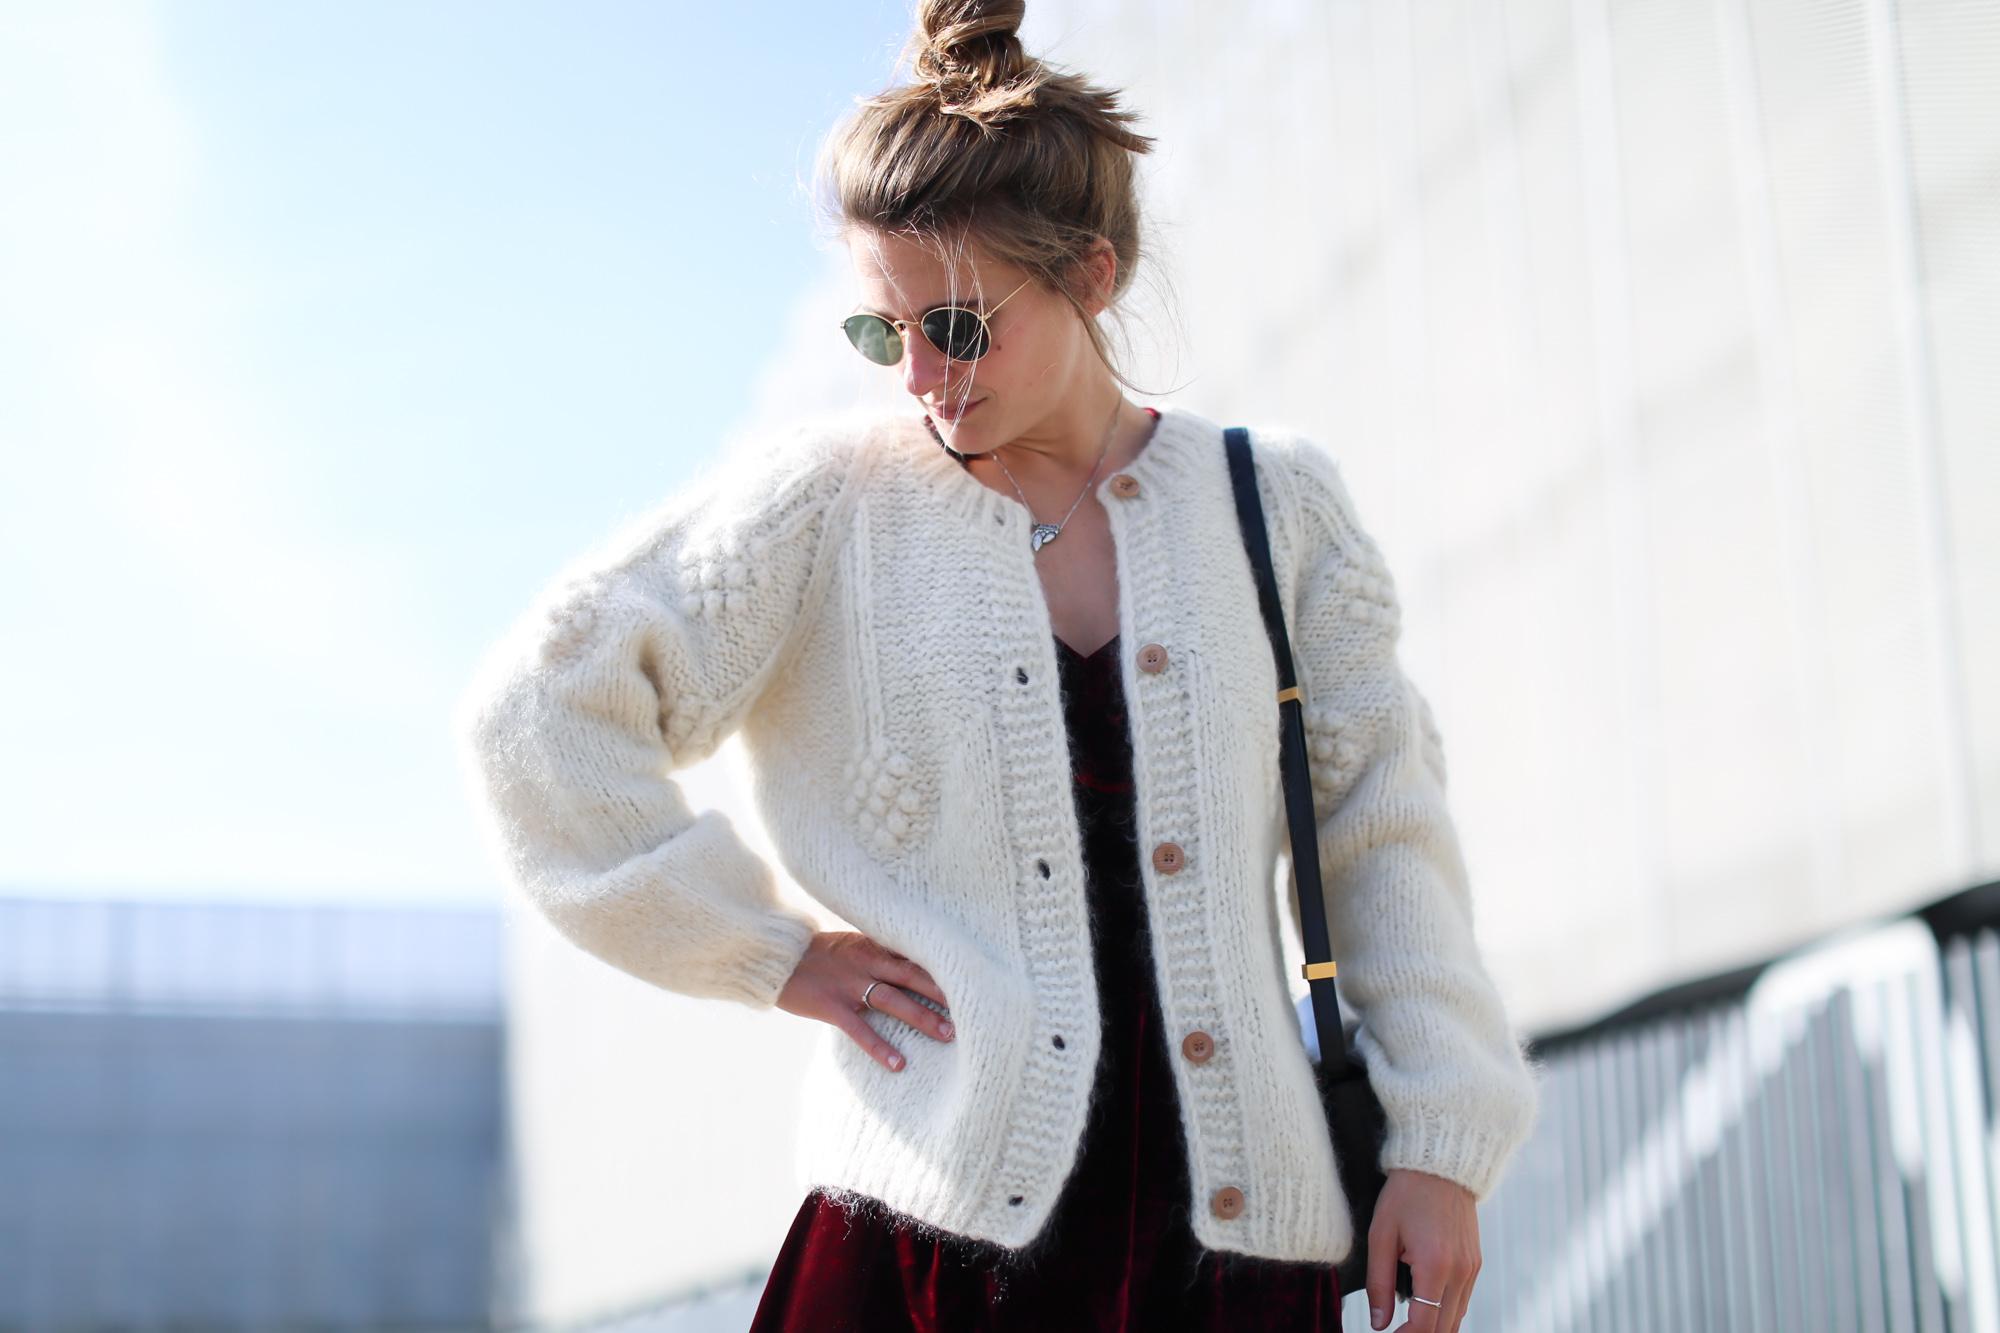 Clochet_streetstyle_fashionblogger_intropia_jerseylanaochosabiertogordito_vestidoterciopelomasscob_adidassambablancas-5